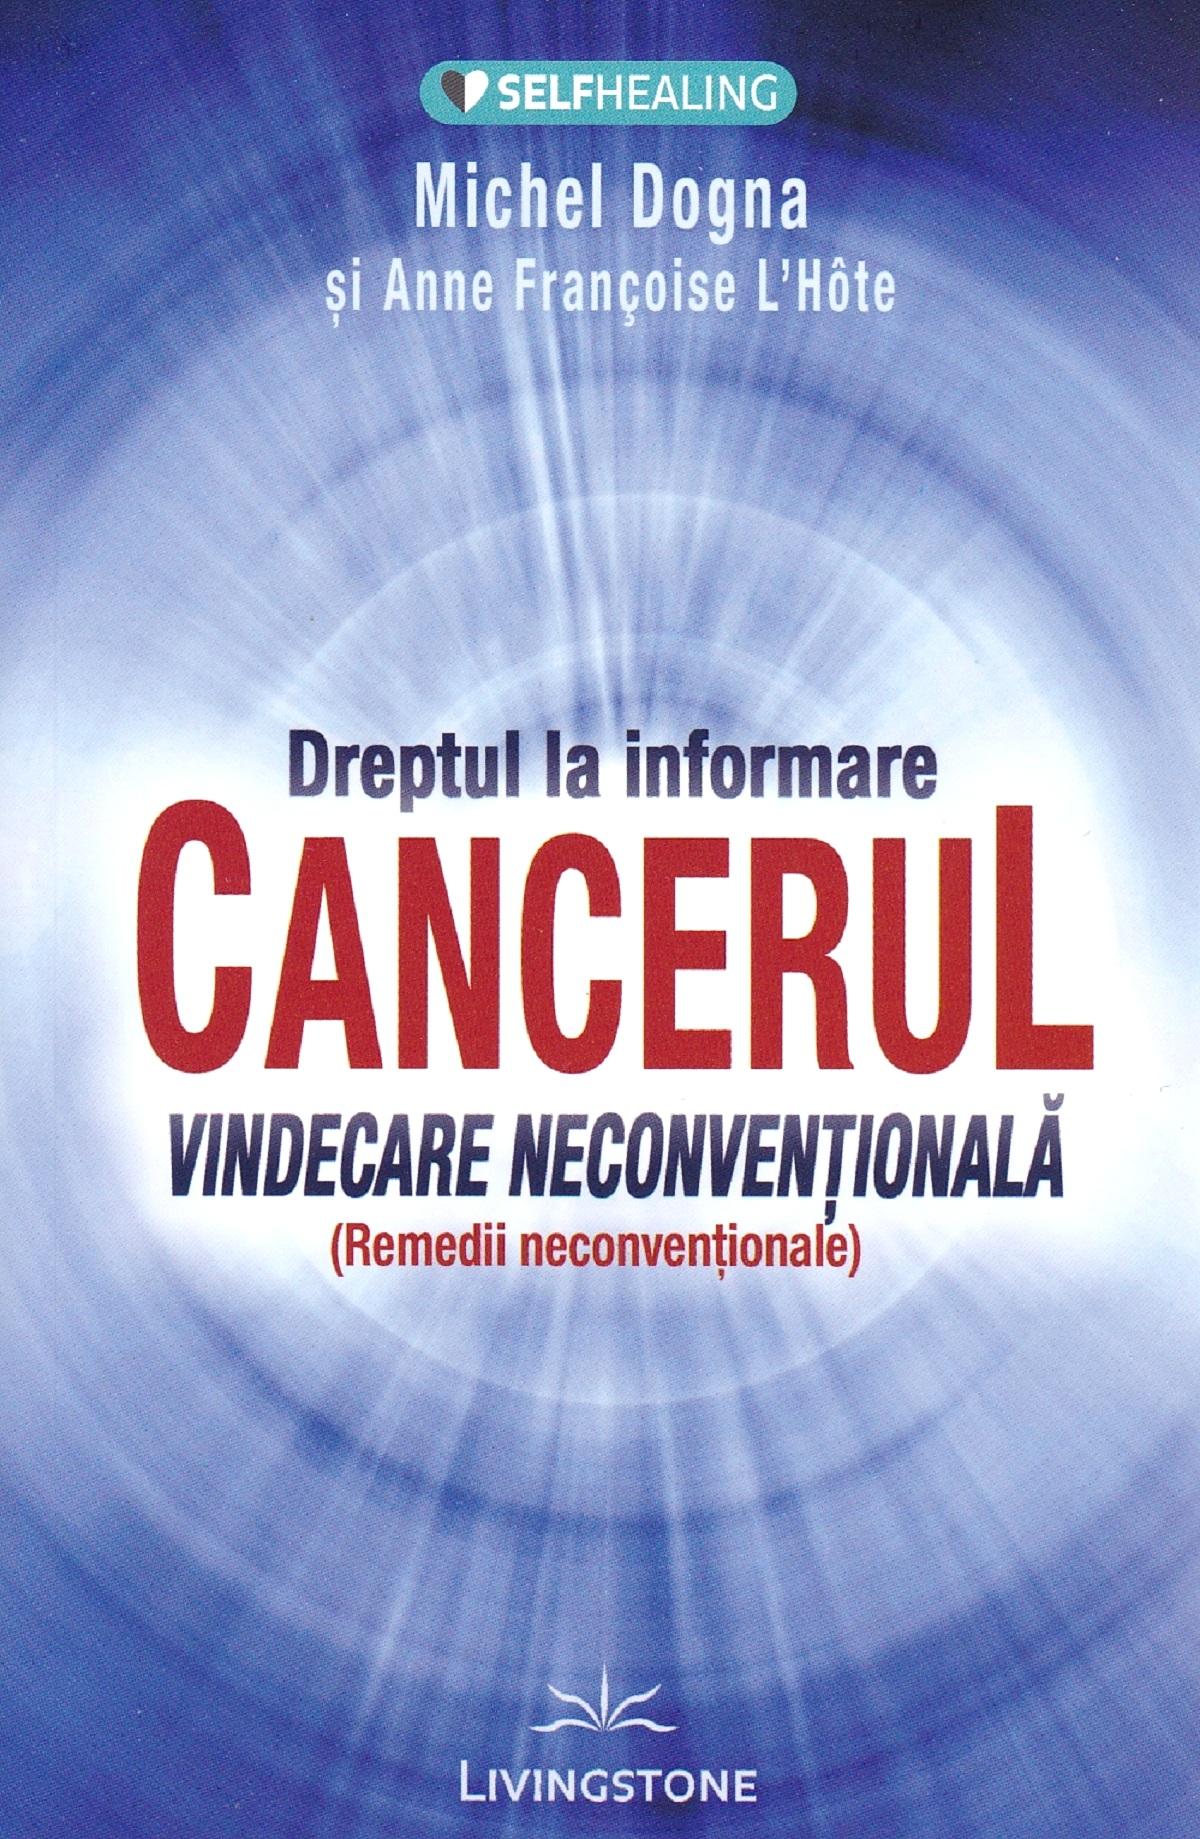 Dreptul la informare: cancerul thumbnail